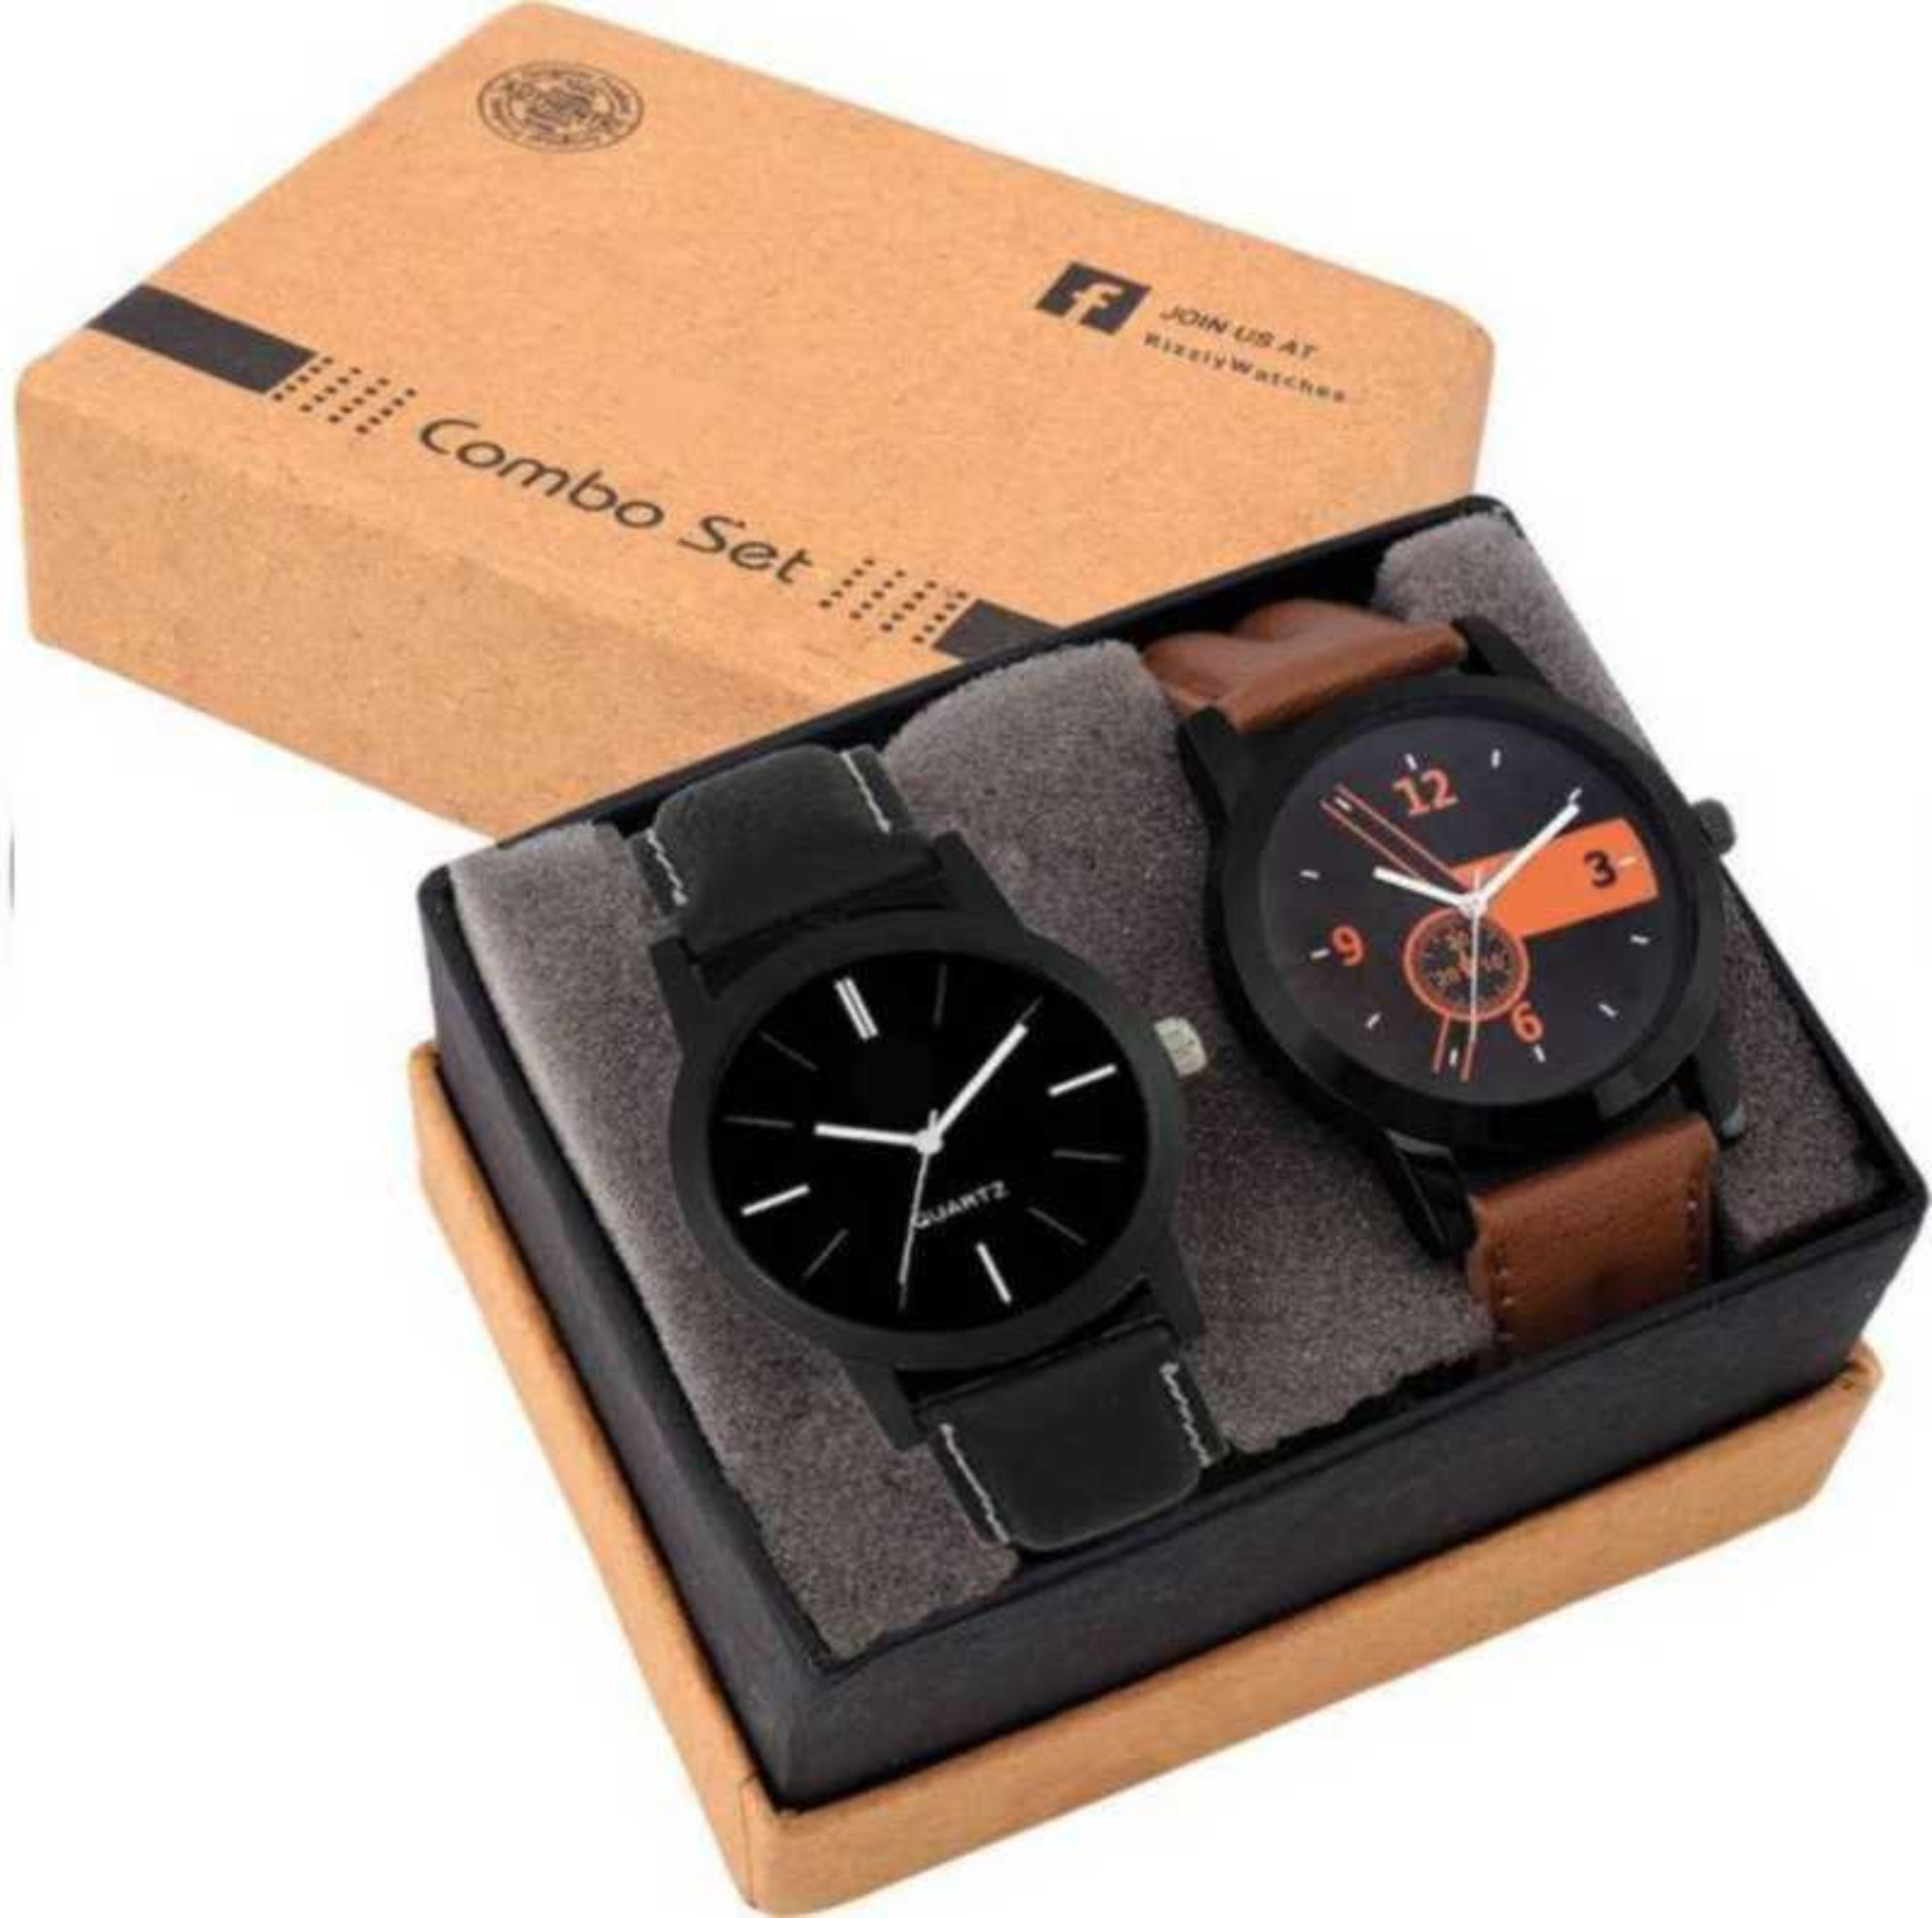 Swadesi Stuff Analog Brown Black Color Luxury watches combo for Men Boys lorem 1 ,4